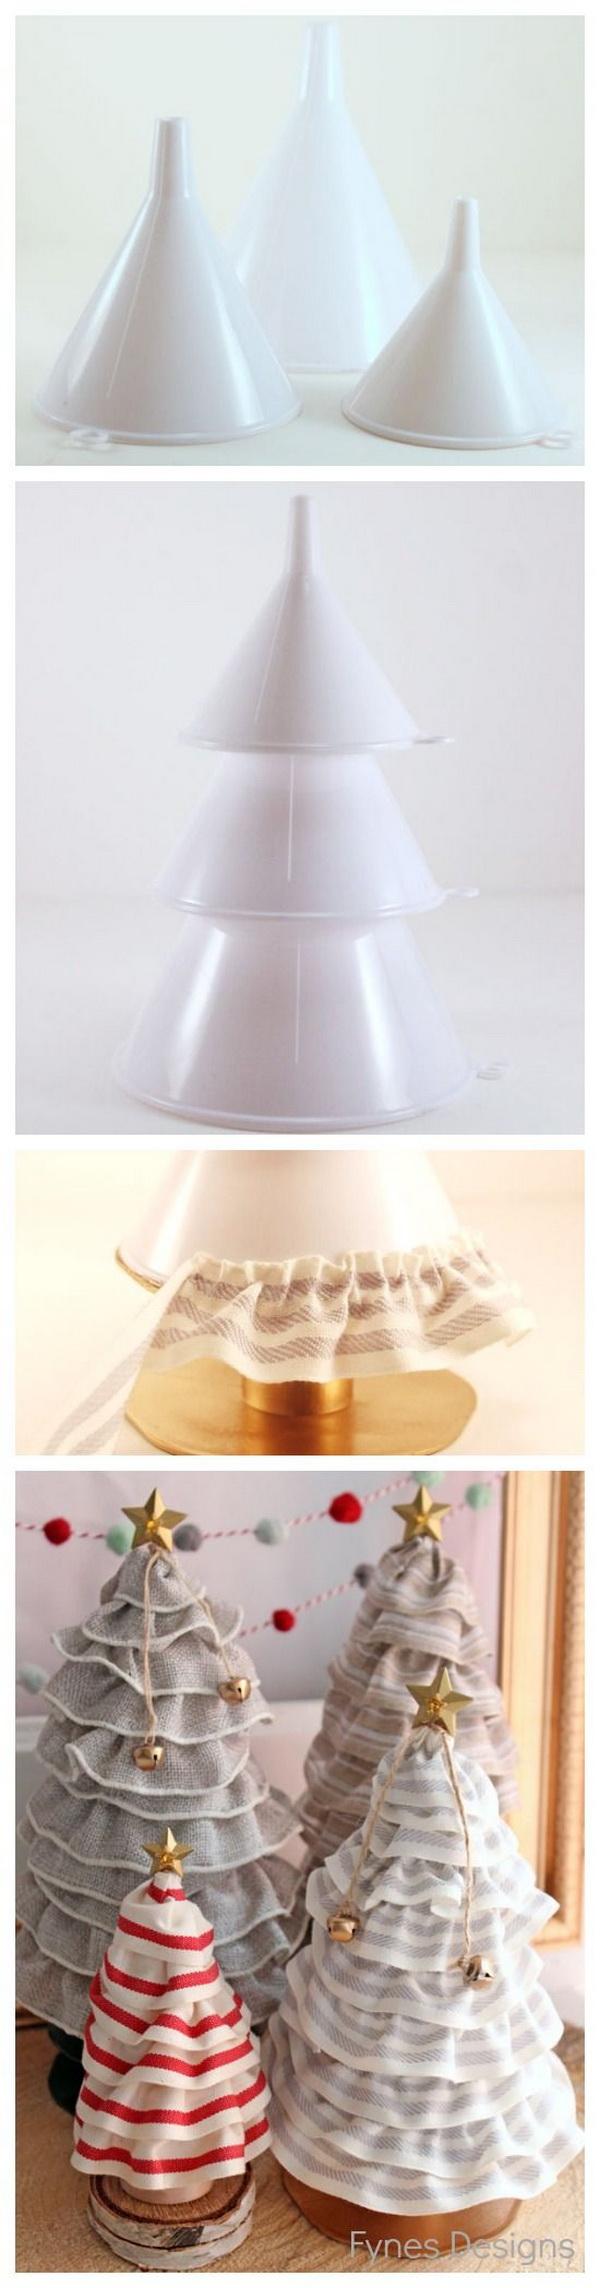 DIY No-sew Ruffle Ribbon Christmas Tree Cones